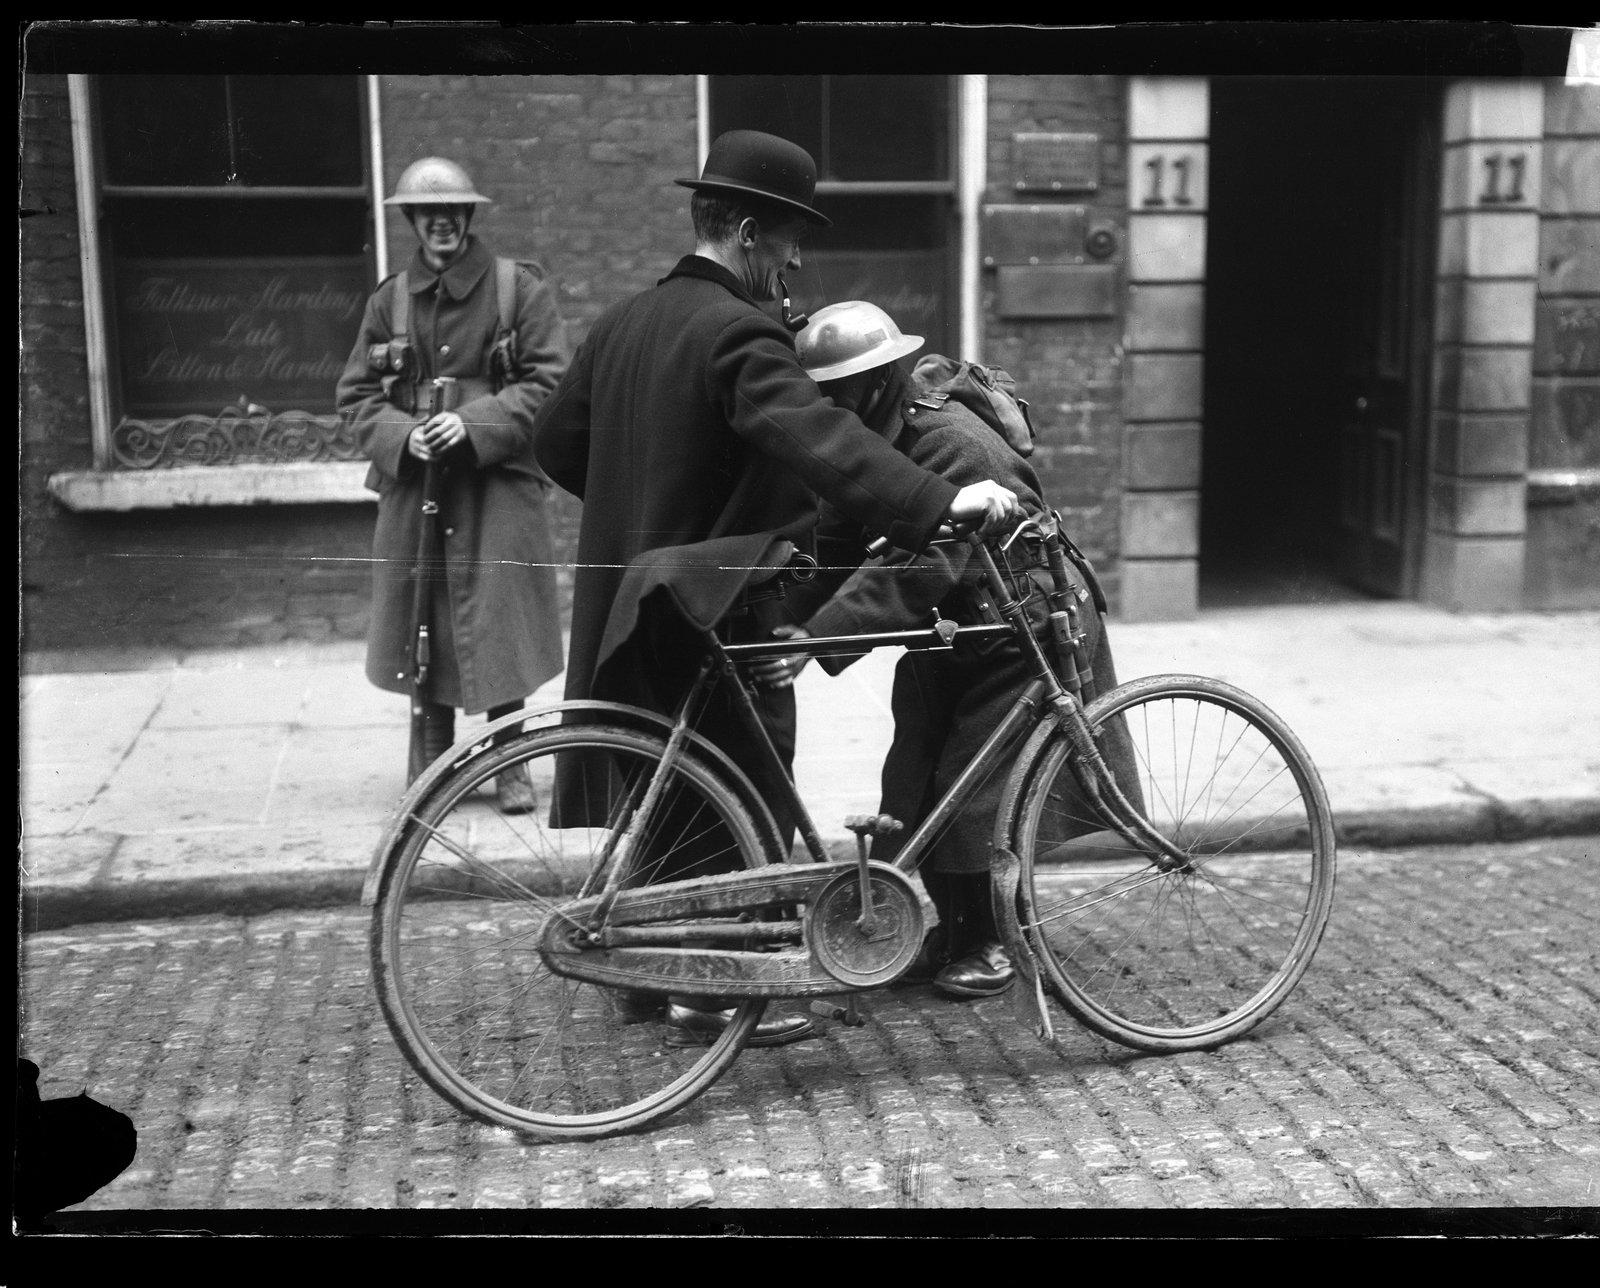 Image - A soldier searches a civil in Drumcondra, Dublin. Image: RTE Photographic Archive